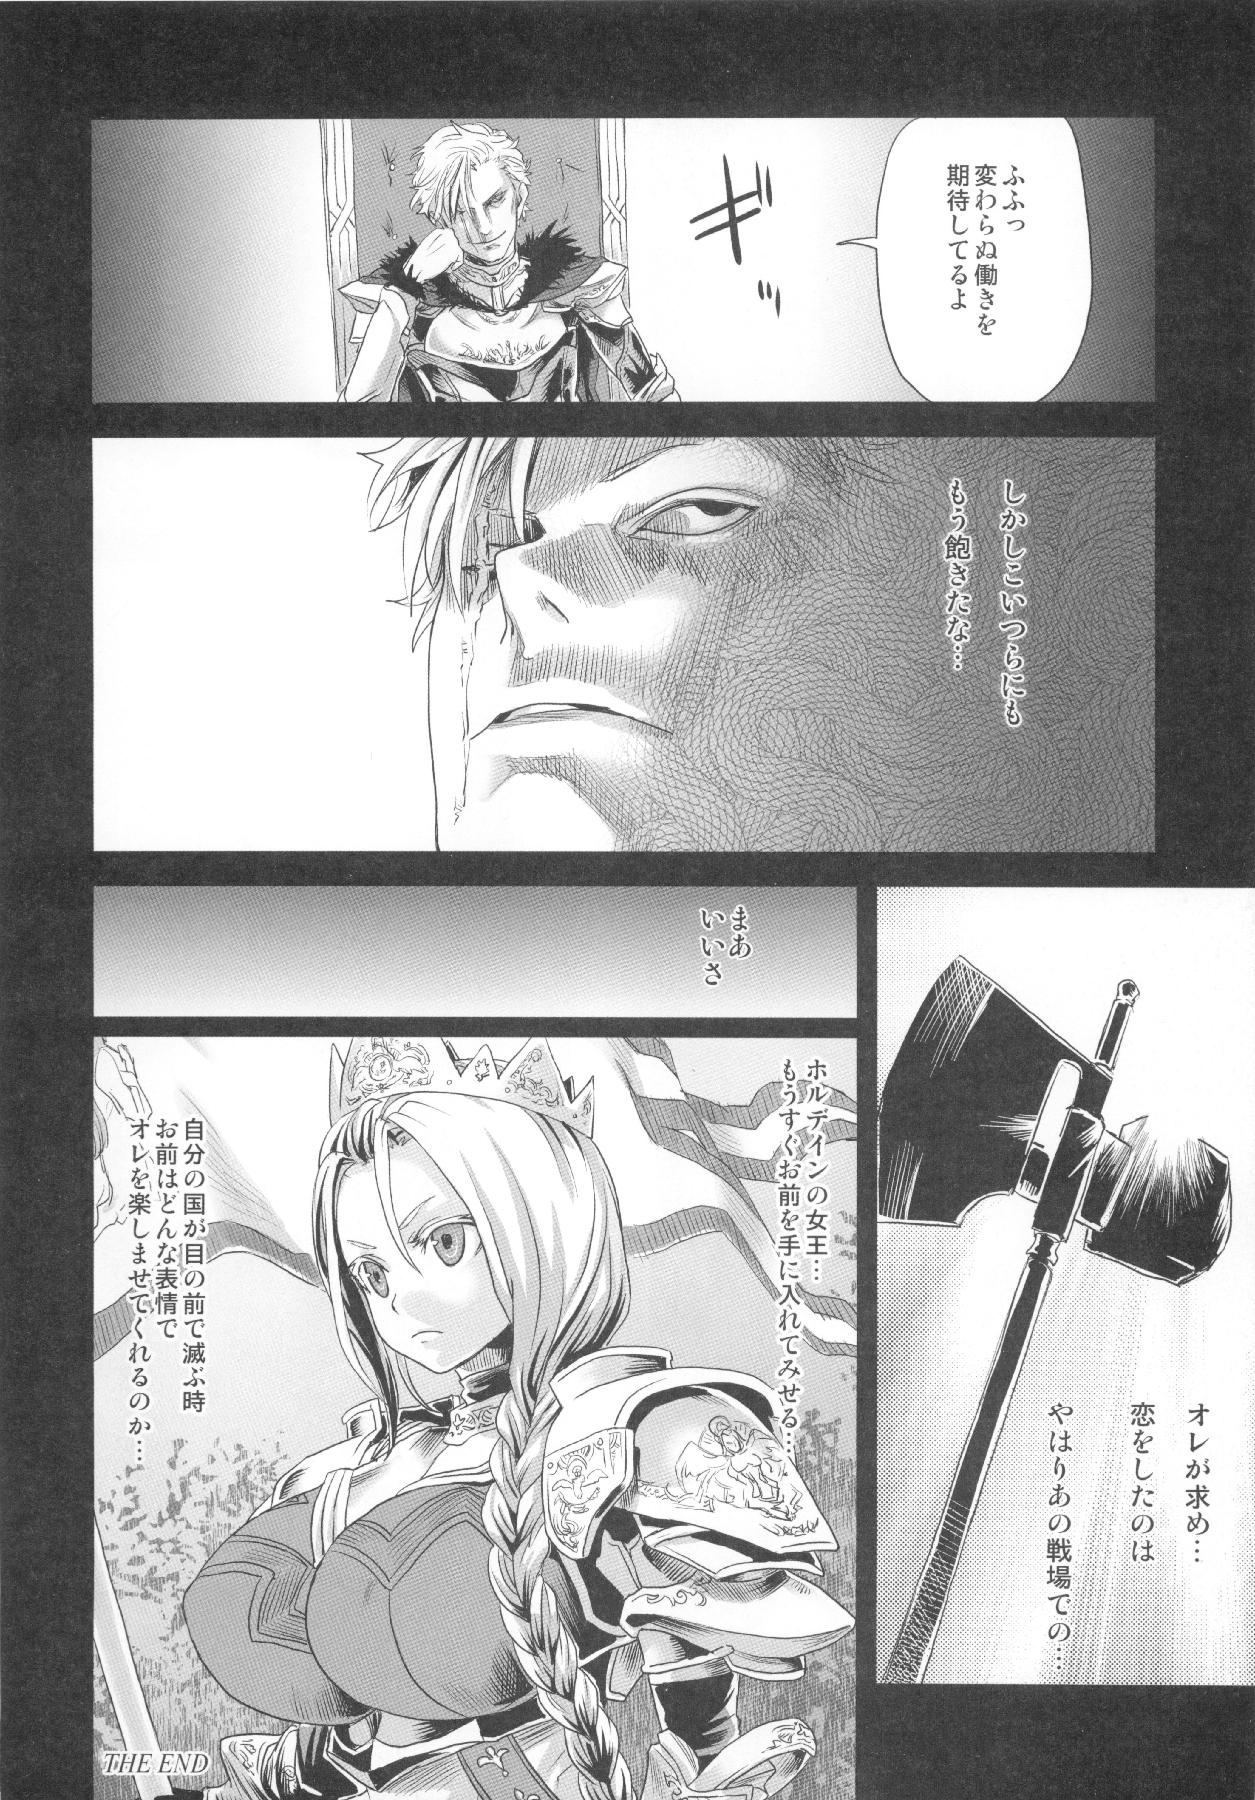 (C83) [Fatalpulse (Asanagi)] VictimGirls Compiled Vol.1 -Victimgirls Soushuuhen 1- MMO Game Selection (Various) 152